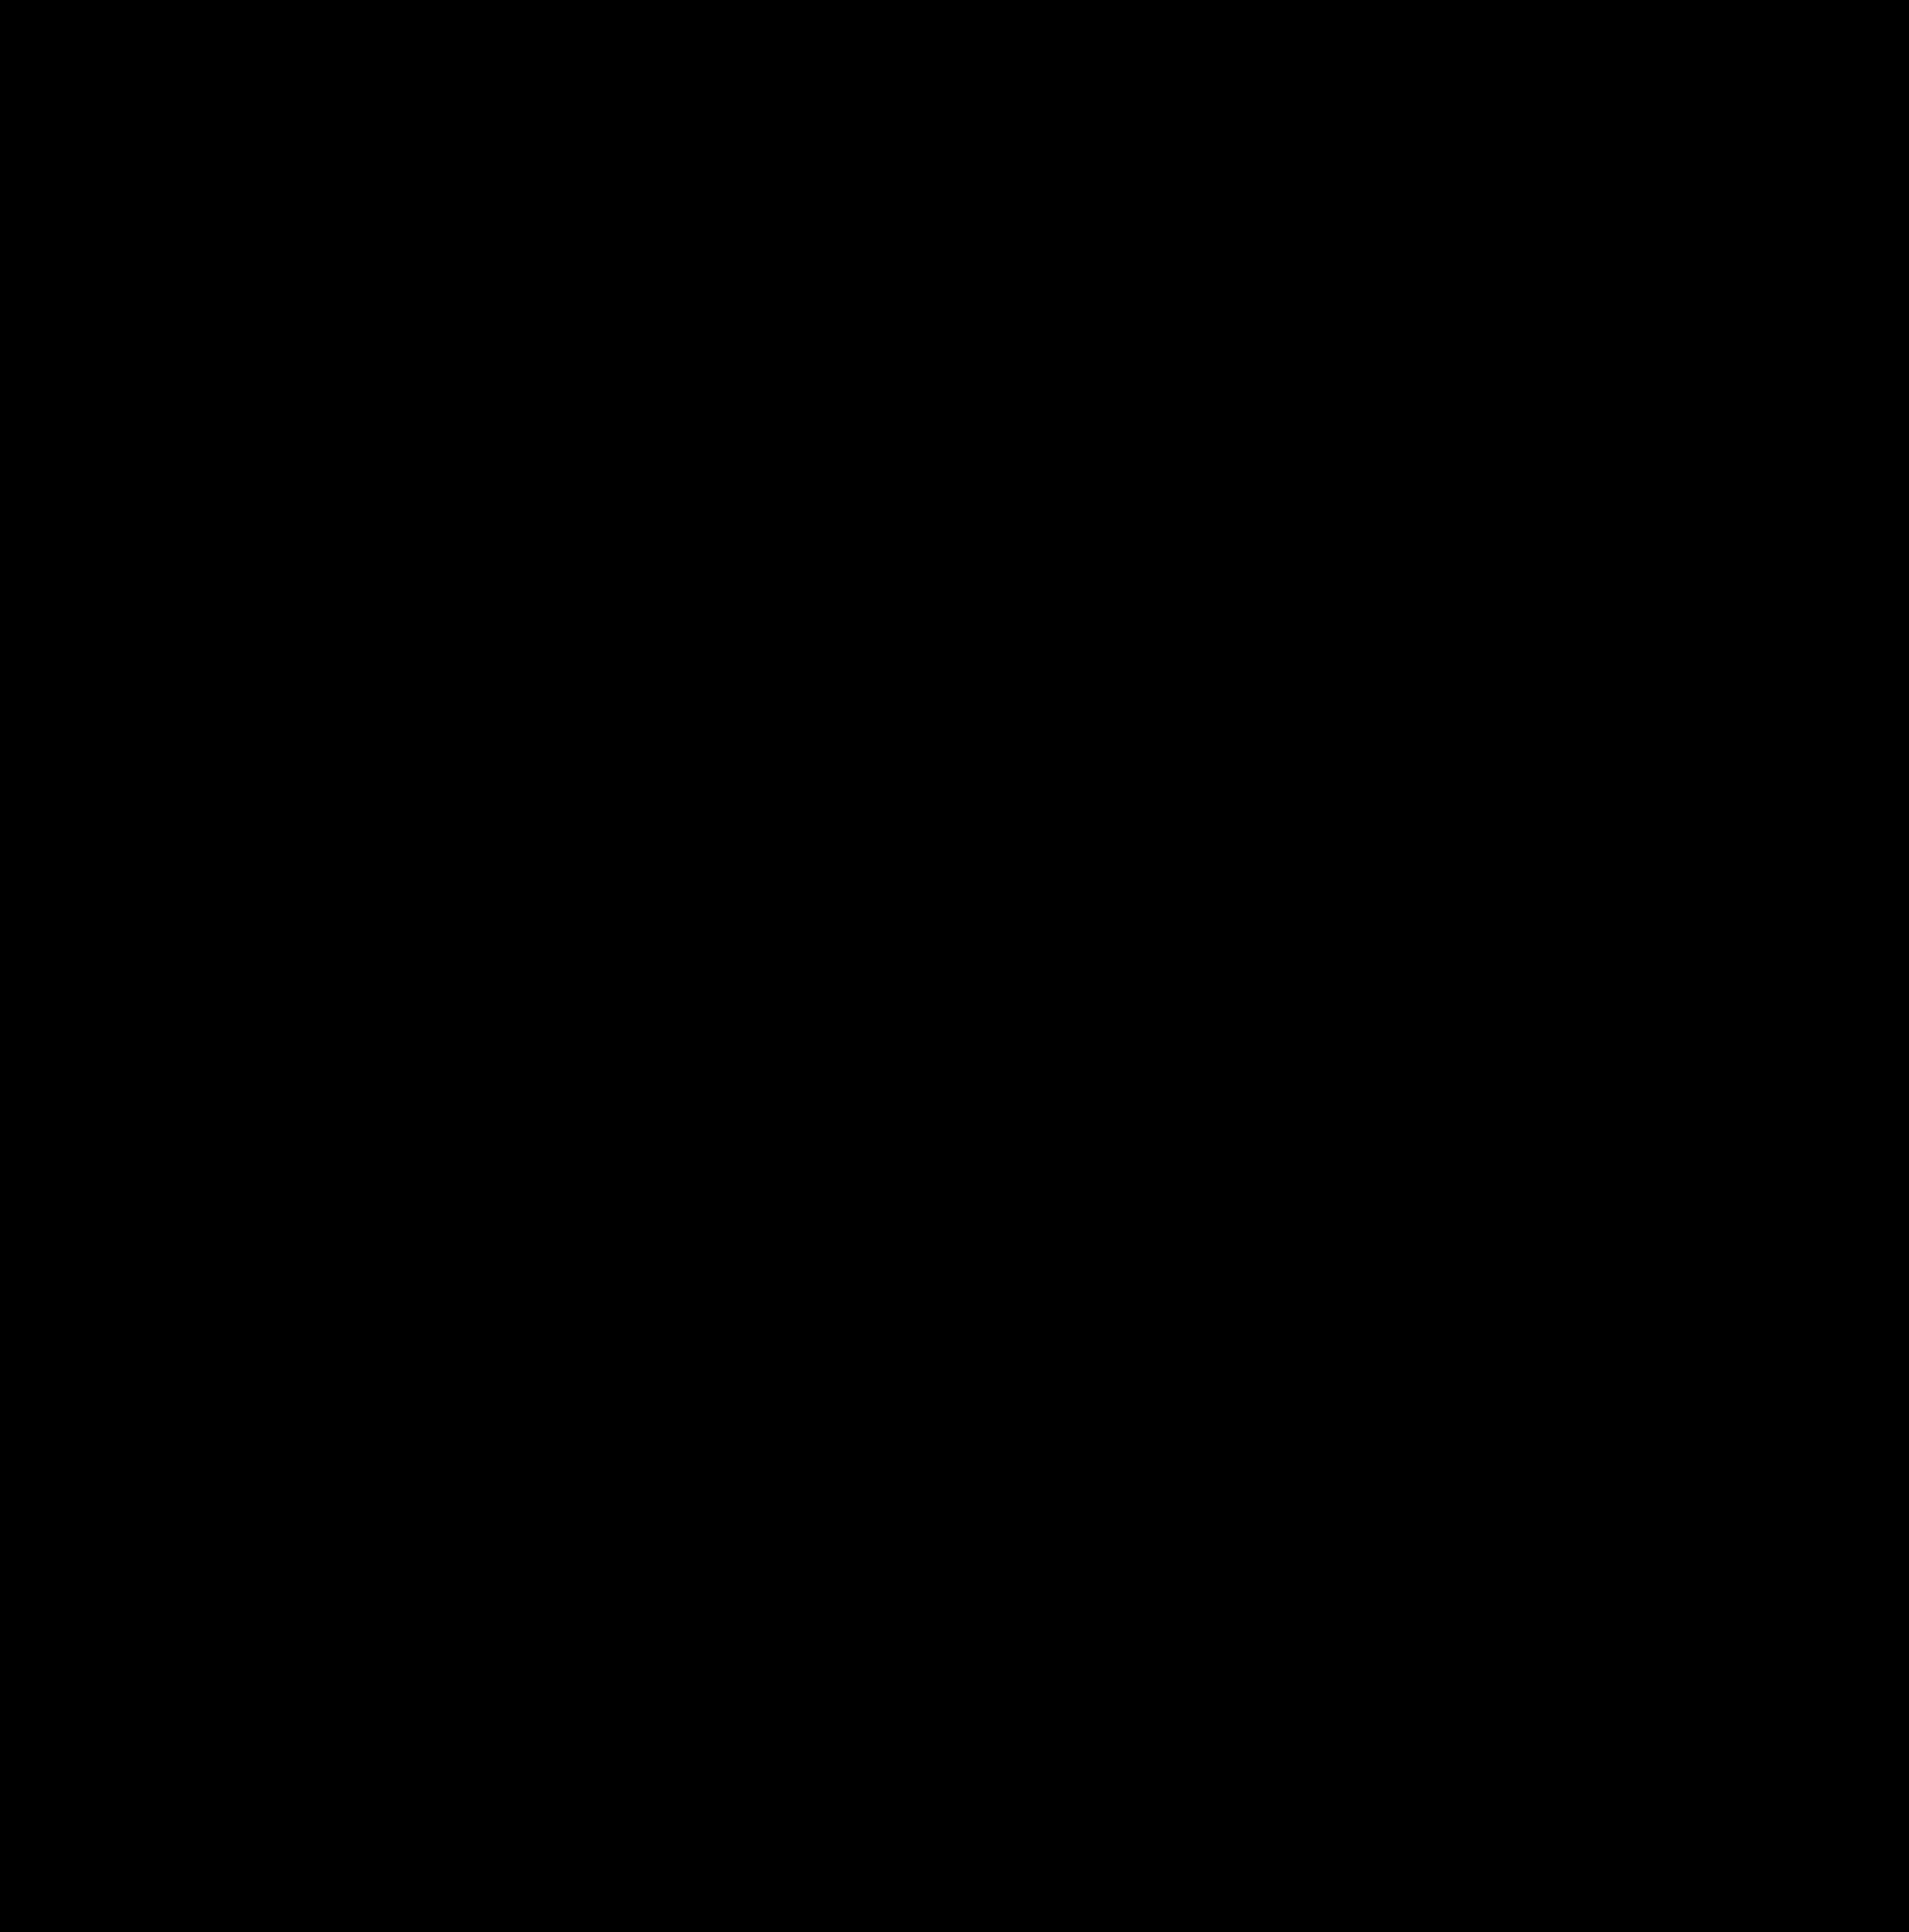 Photo Of Flower Ring Frame Vector Clipart 257